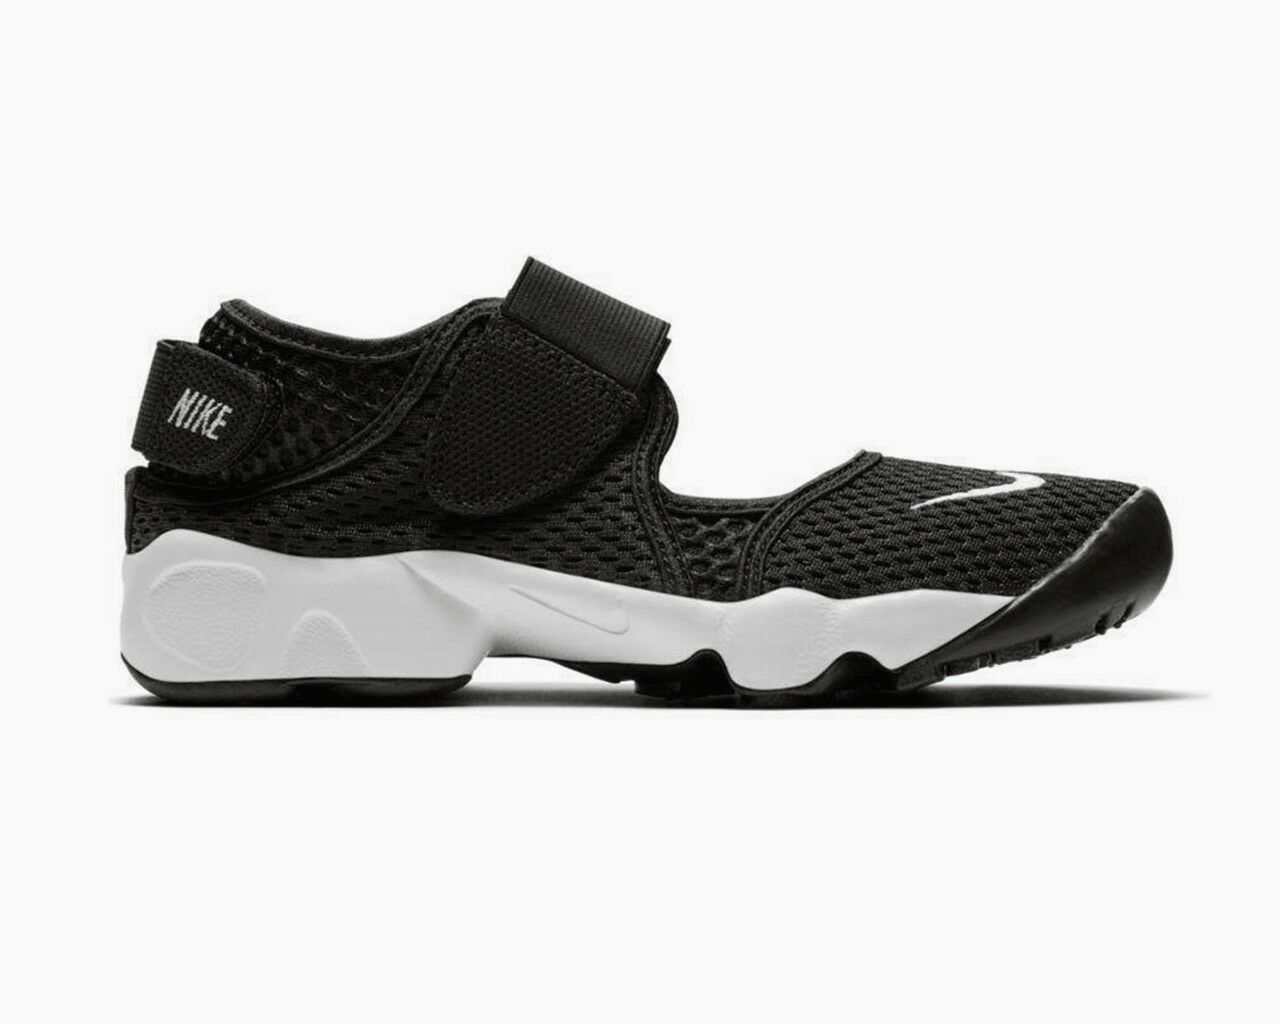 Boys Nike RIFT PS GS 314149 014 Girls Shoes Black Ladies Gym Summer Trainers